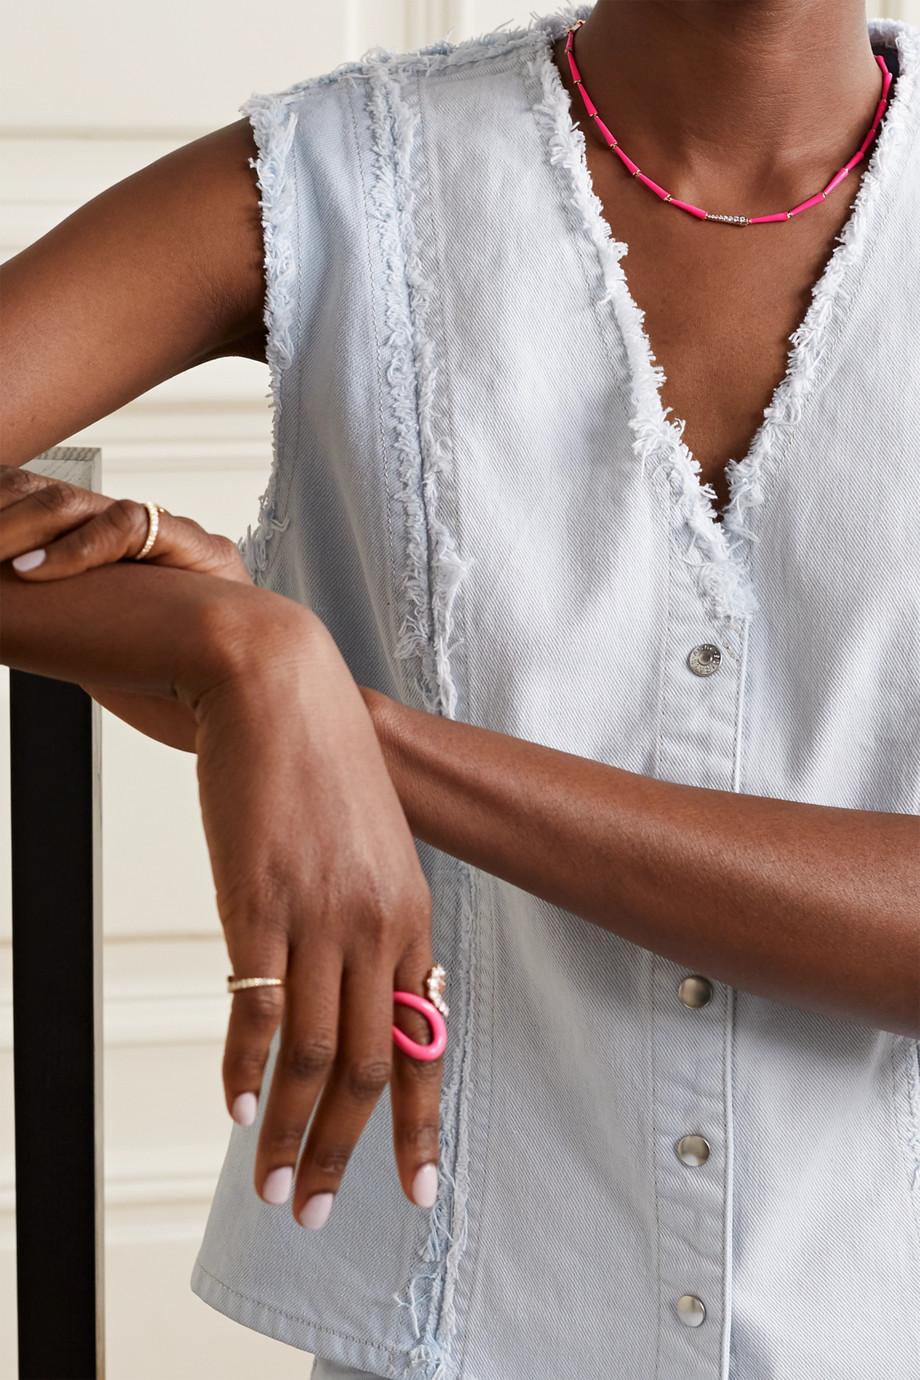 Melissa Kaye Lola 18-karat rose gold, diamond and neon enamel necklace